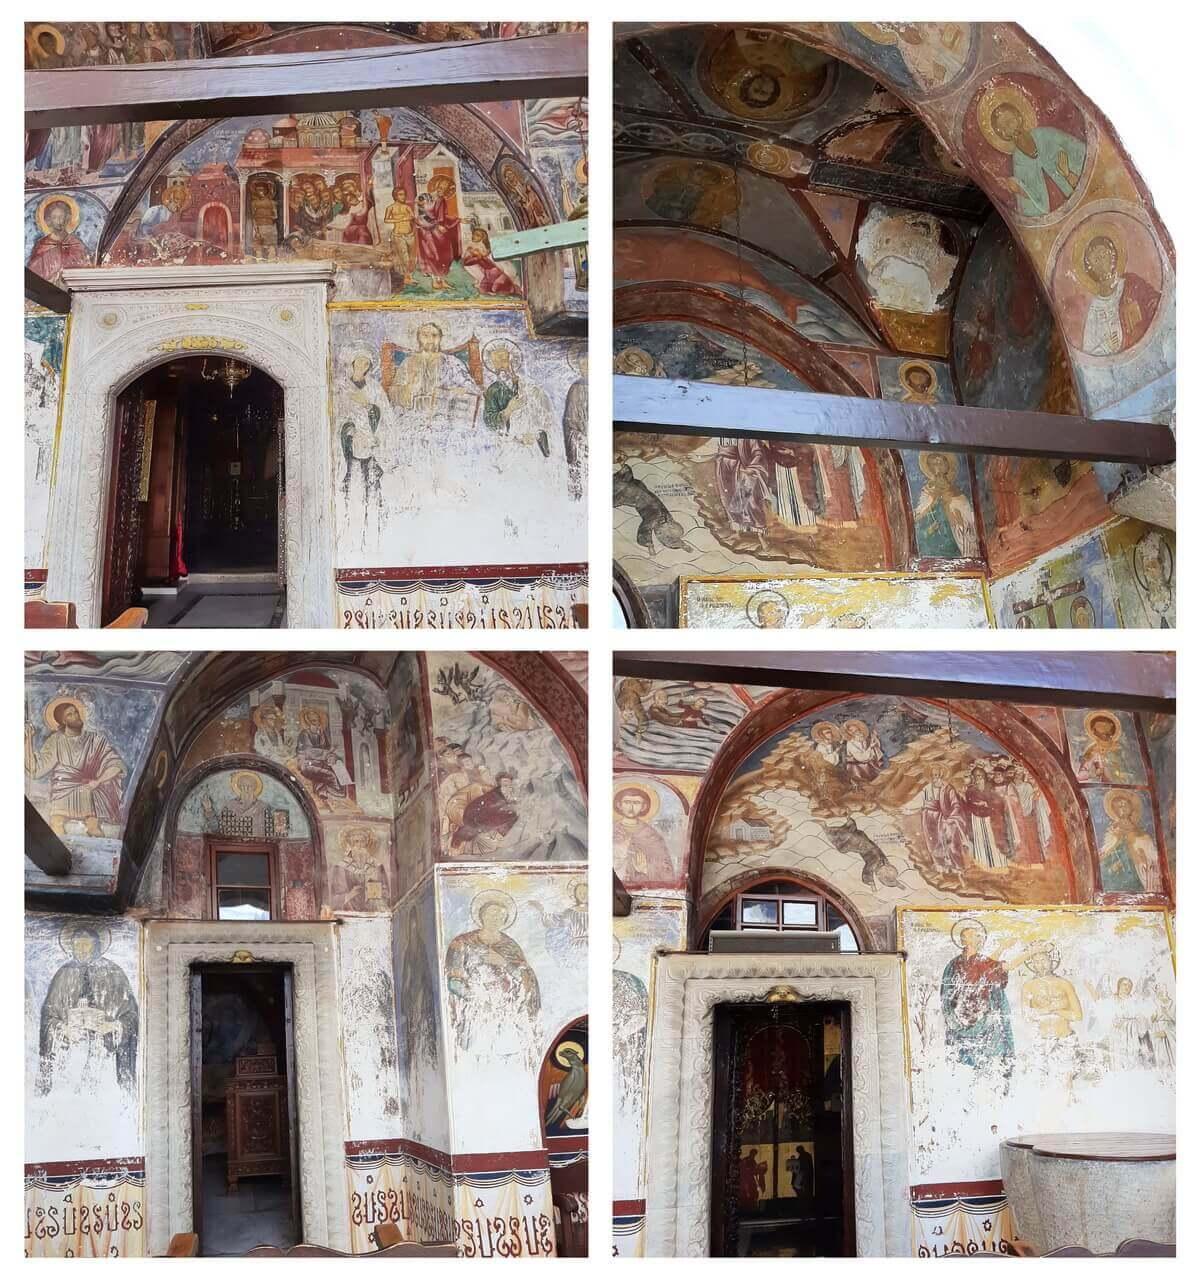 Frescoes in the St John monastery